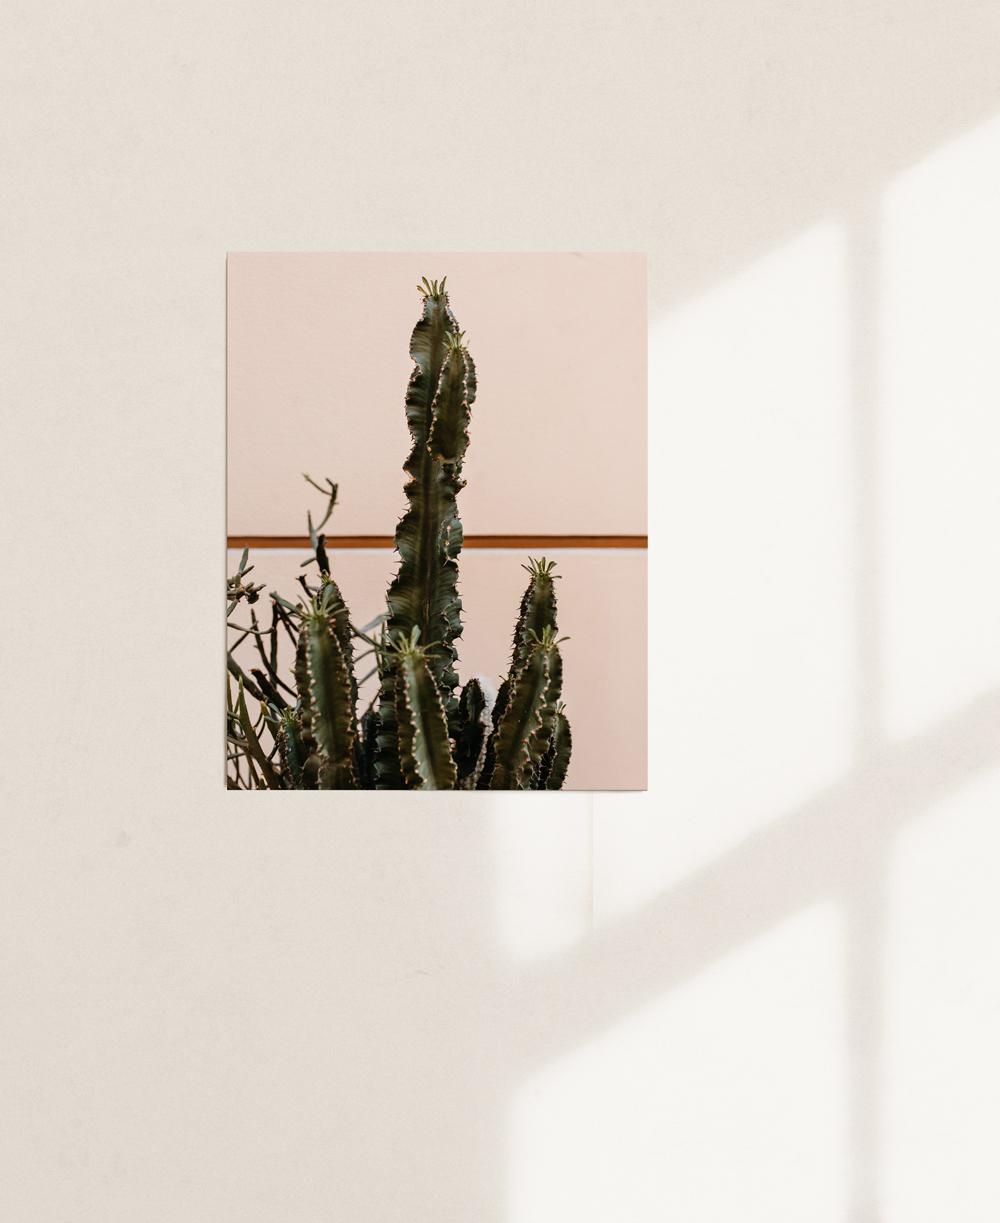 nicischwab-prints-02-007